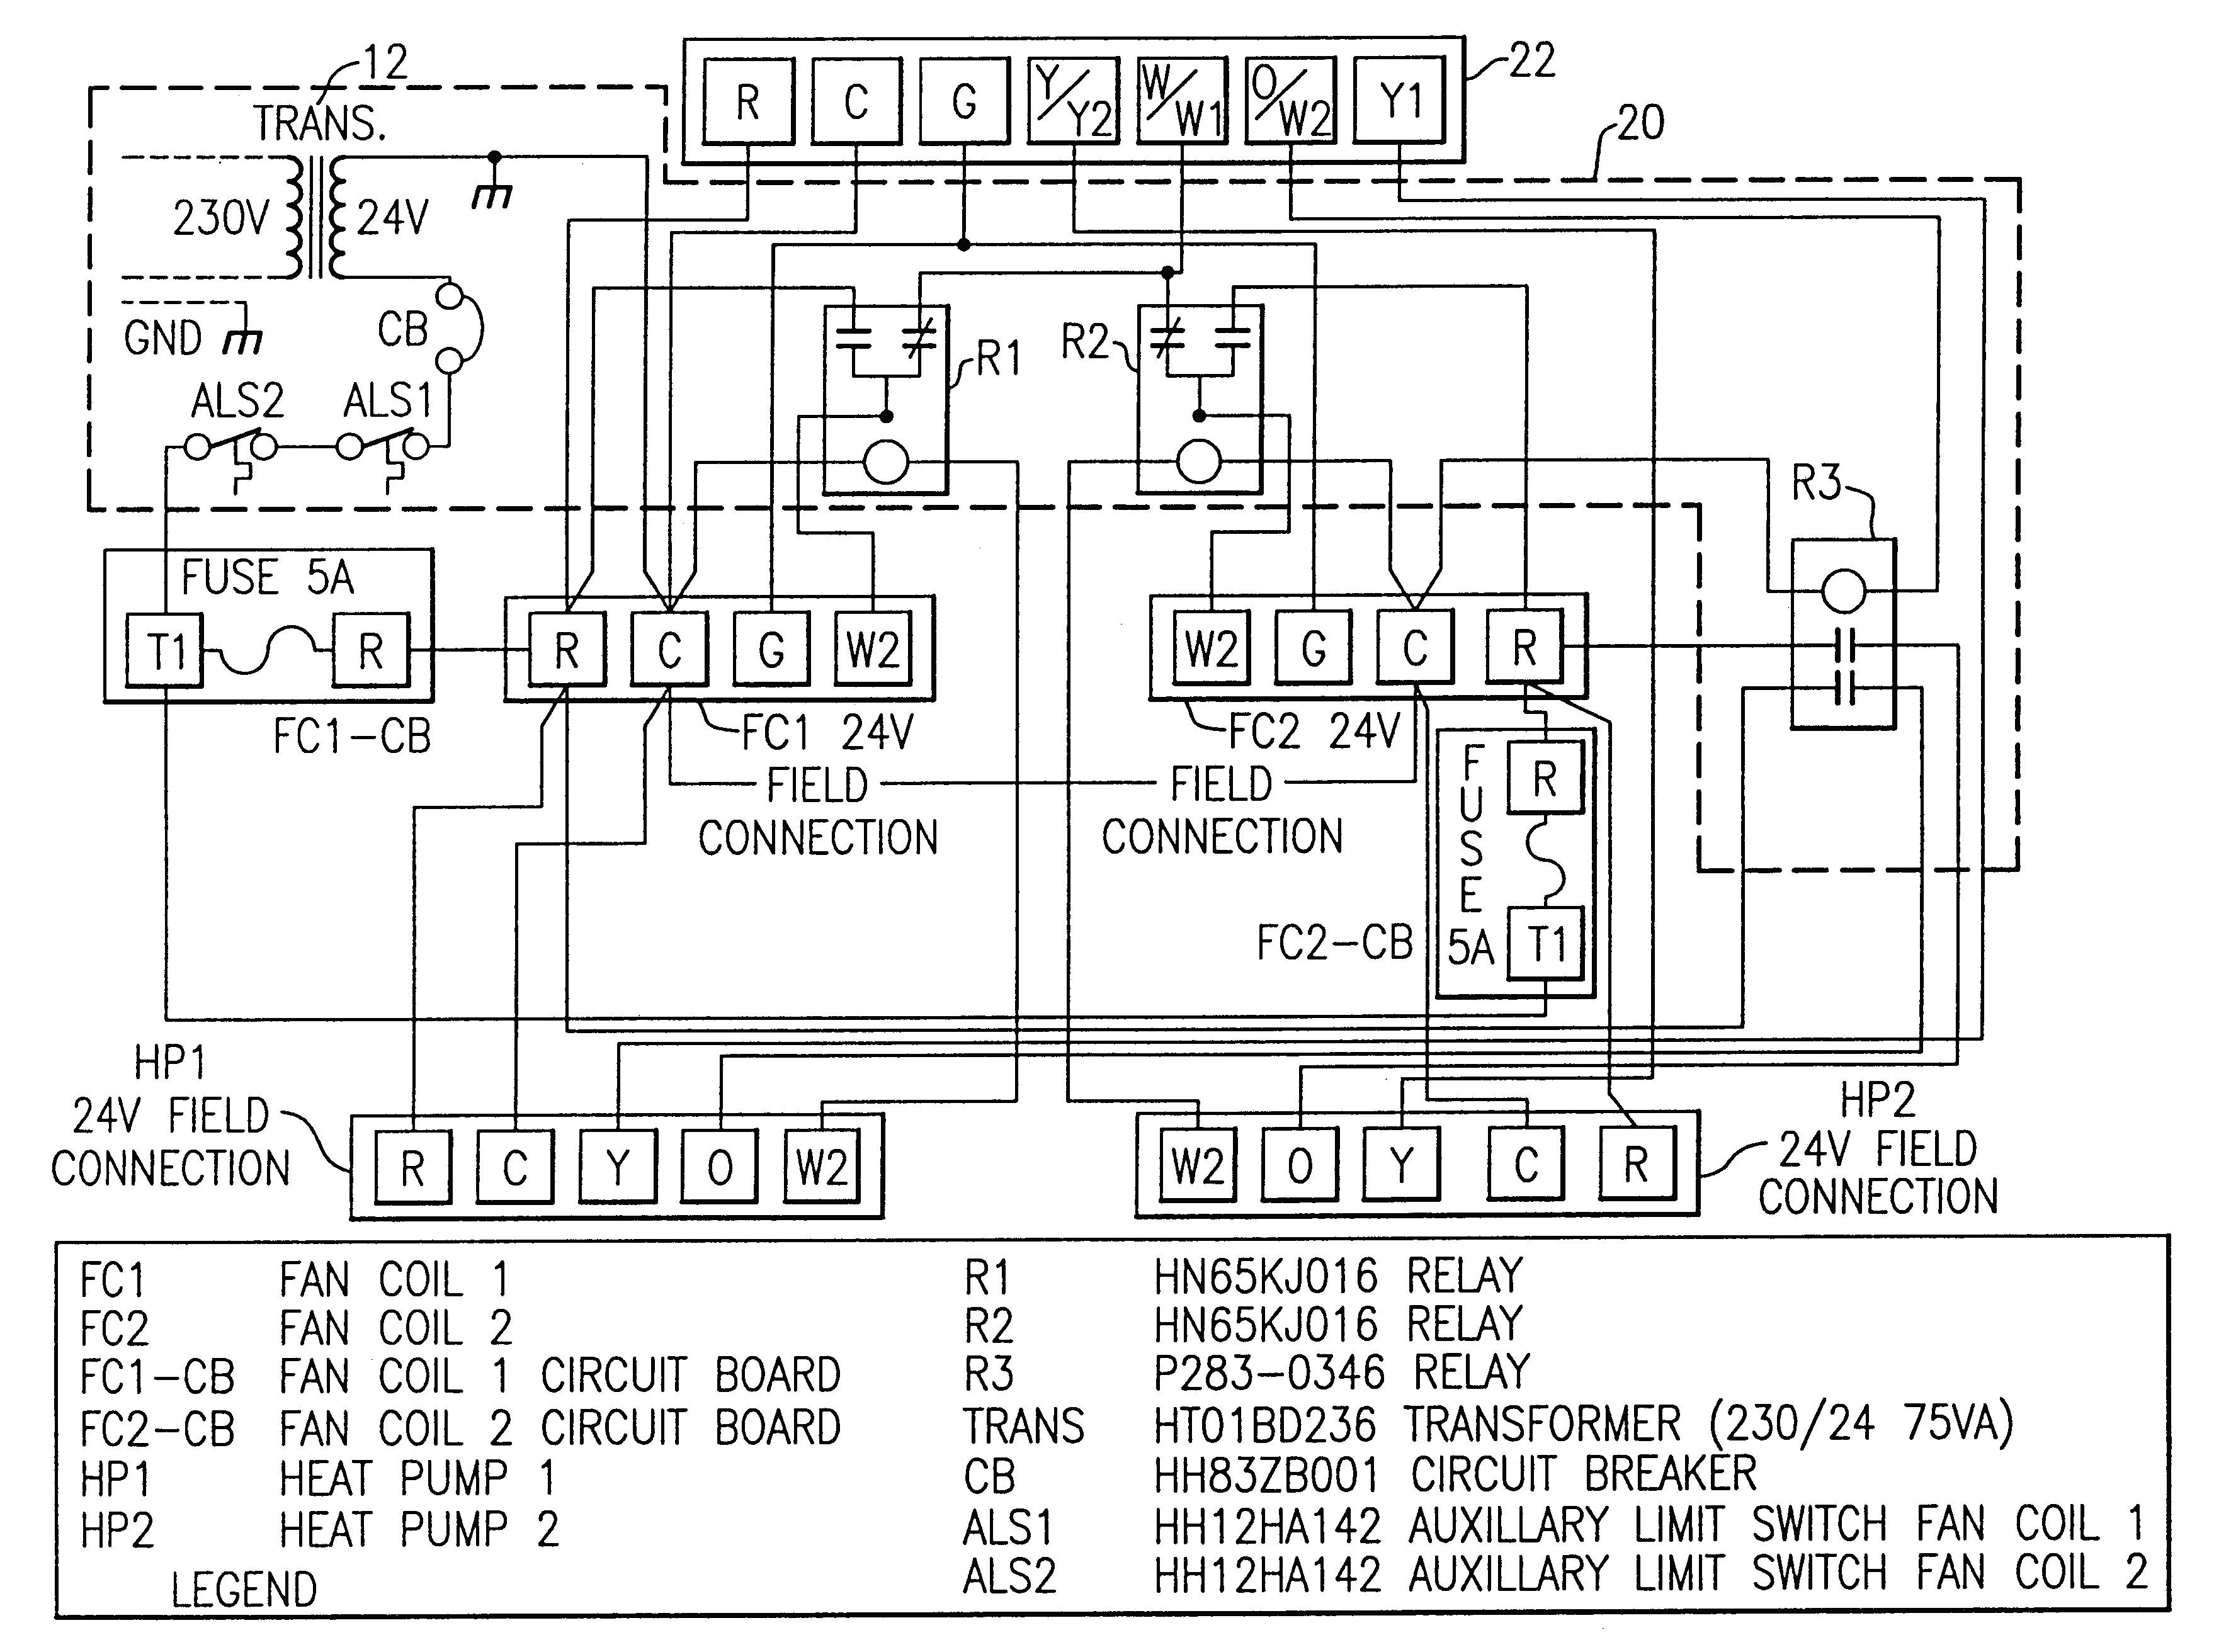 furnace fan motor wiring diagram Collection-Blower Motor Wiring Diagram Inspirational Furnace Blower Motor Wiring Diagram Dejual 10-r